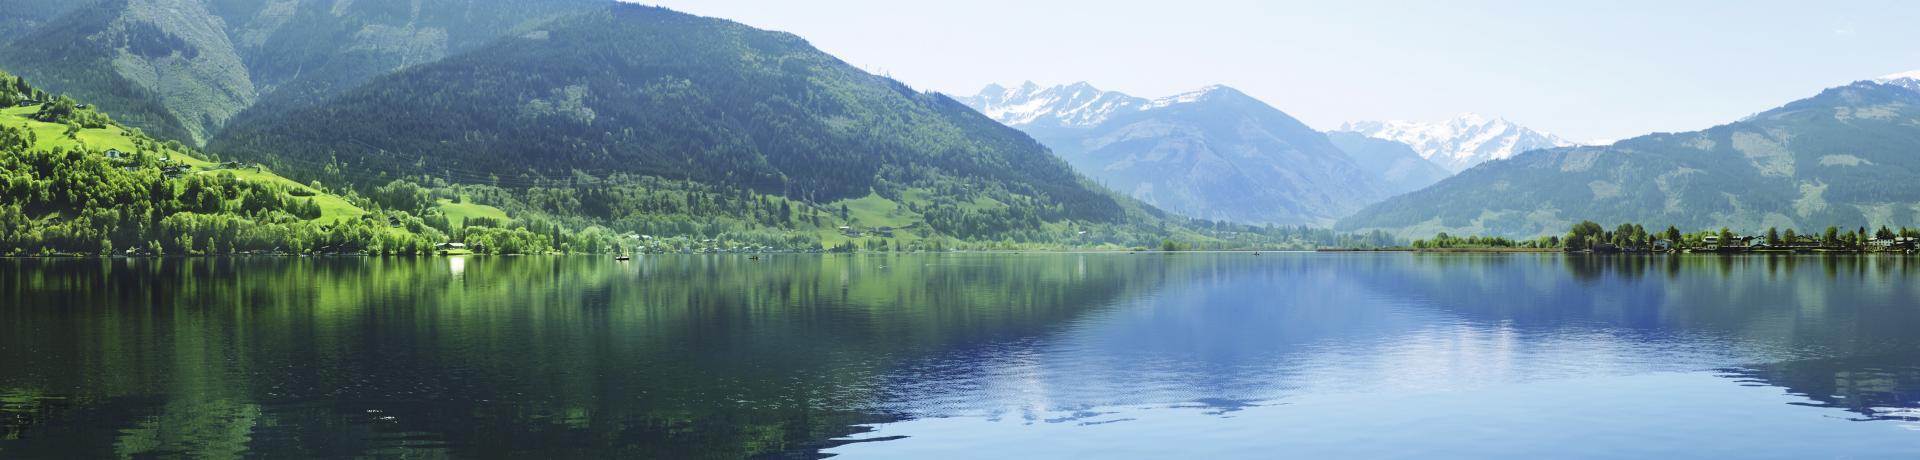 7512+Österreich+Zell_Am_See+TS_177383596.jpg